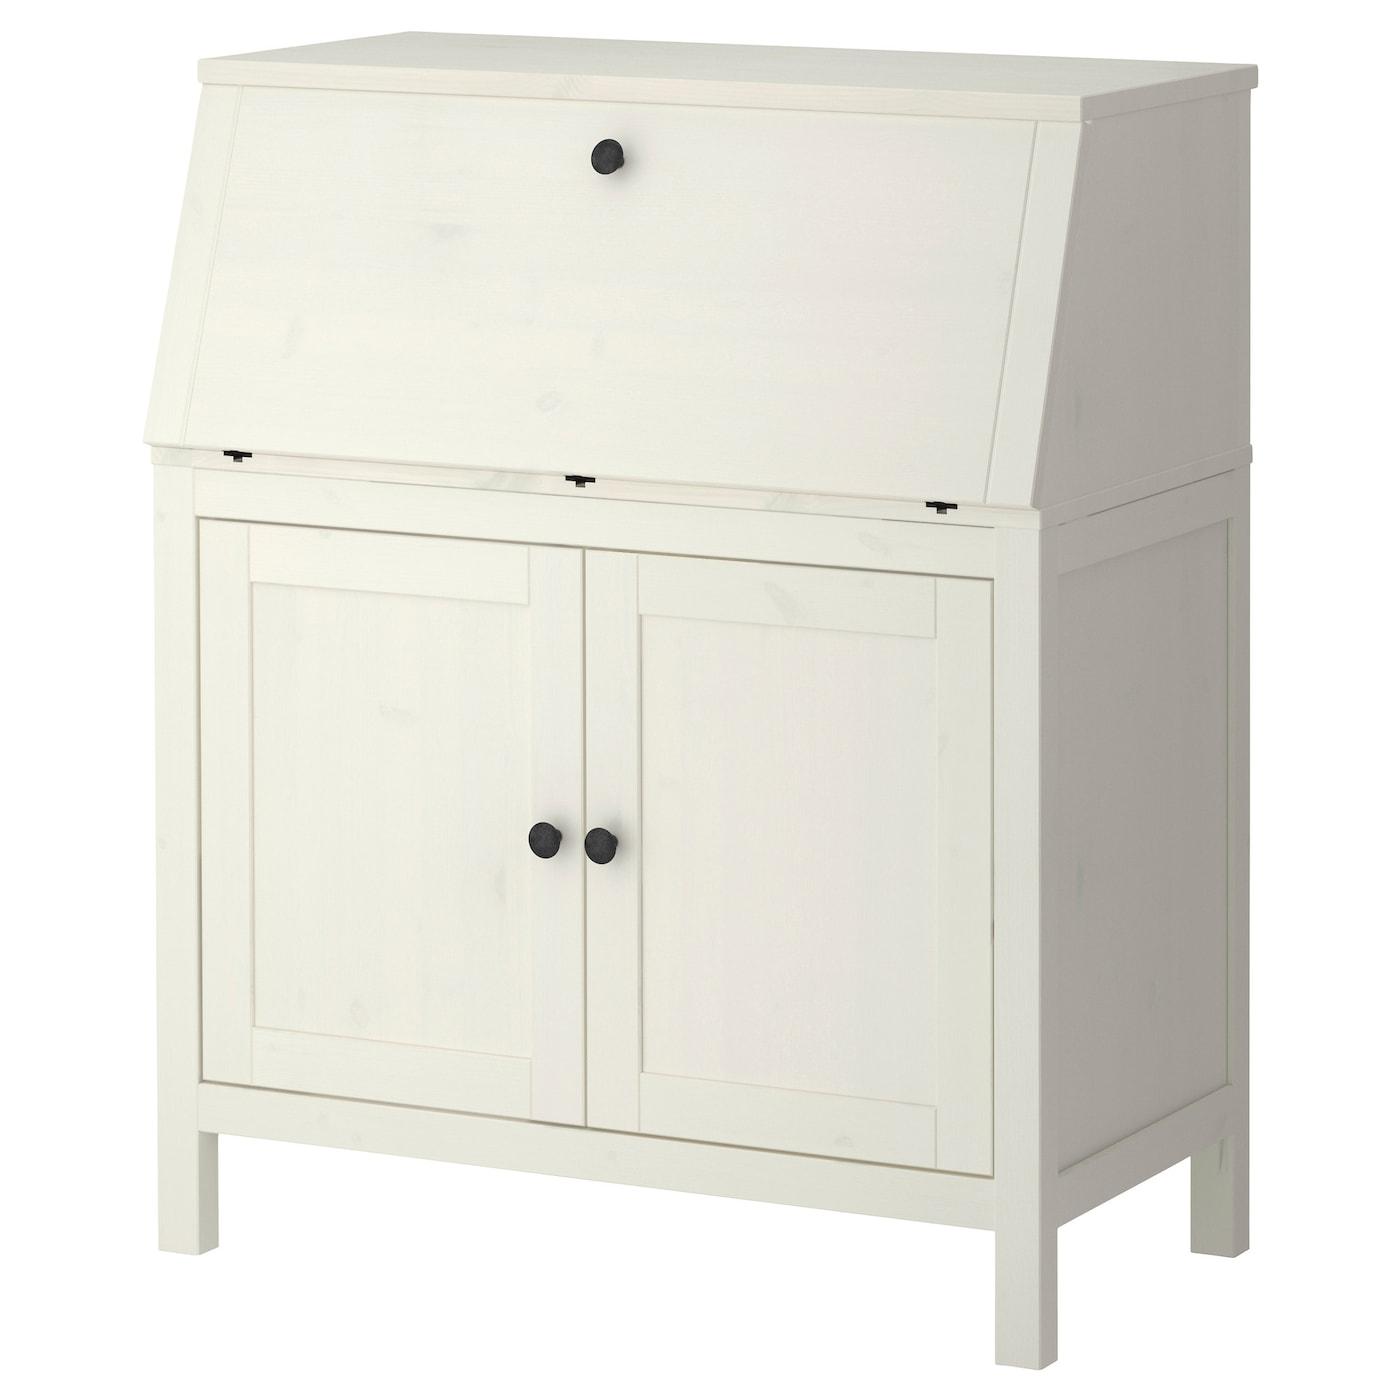 Ikea Hemnes Garderobe Fkh